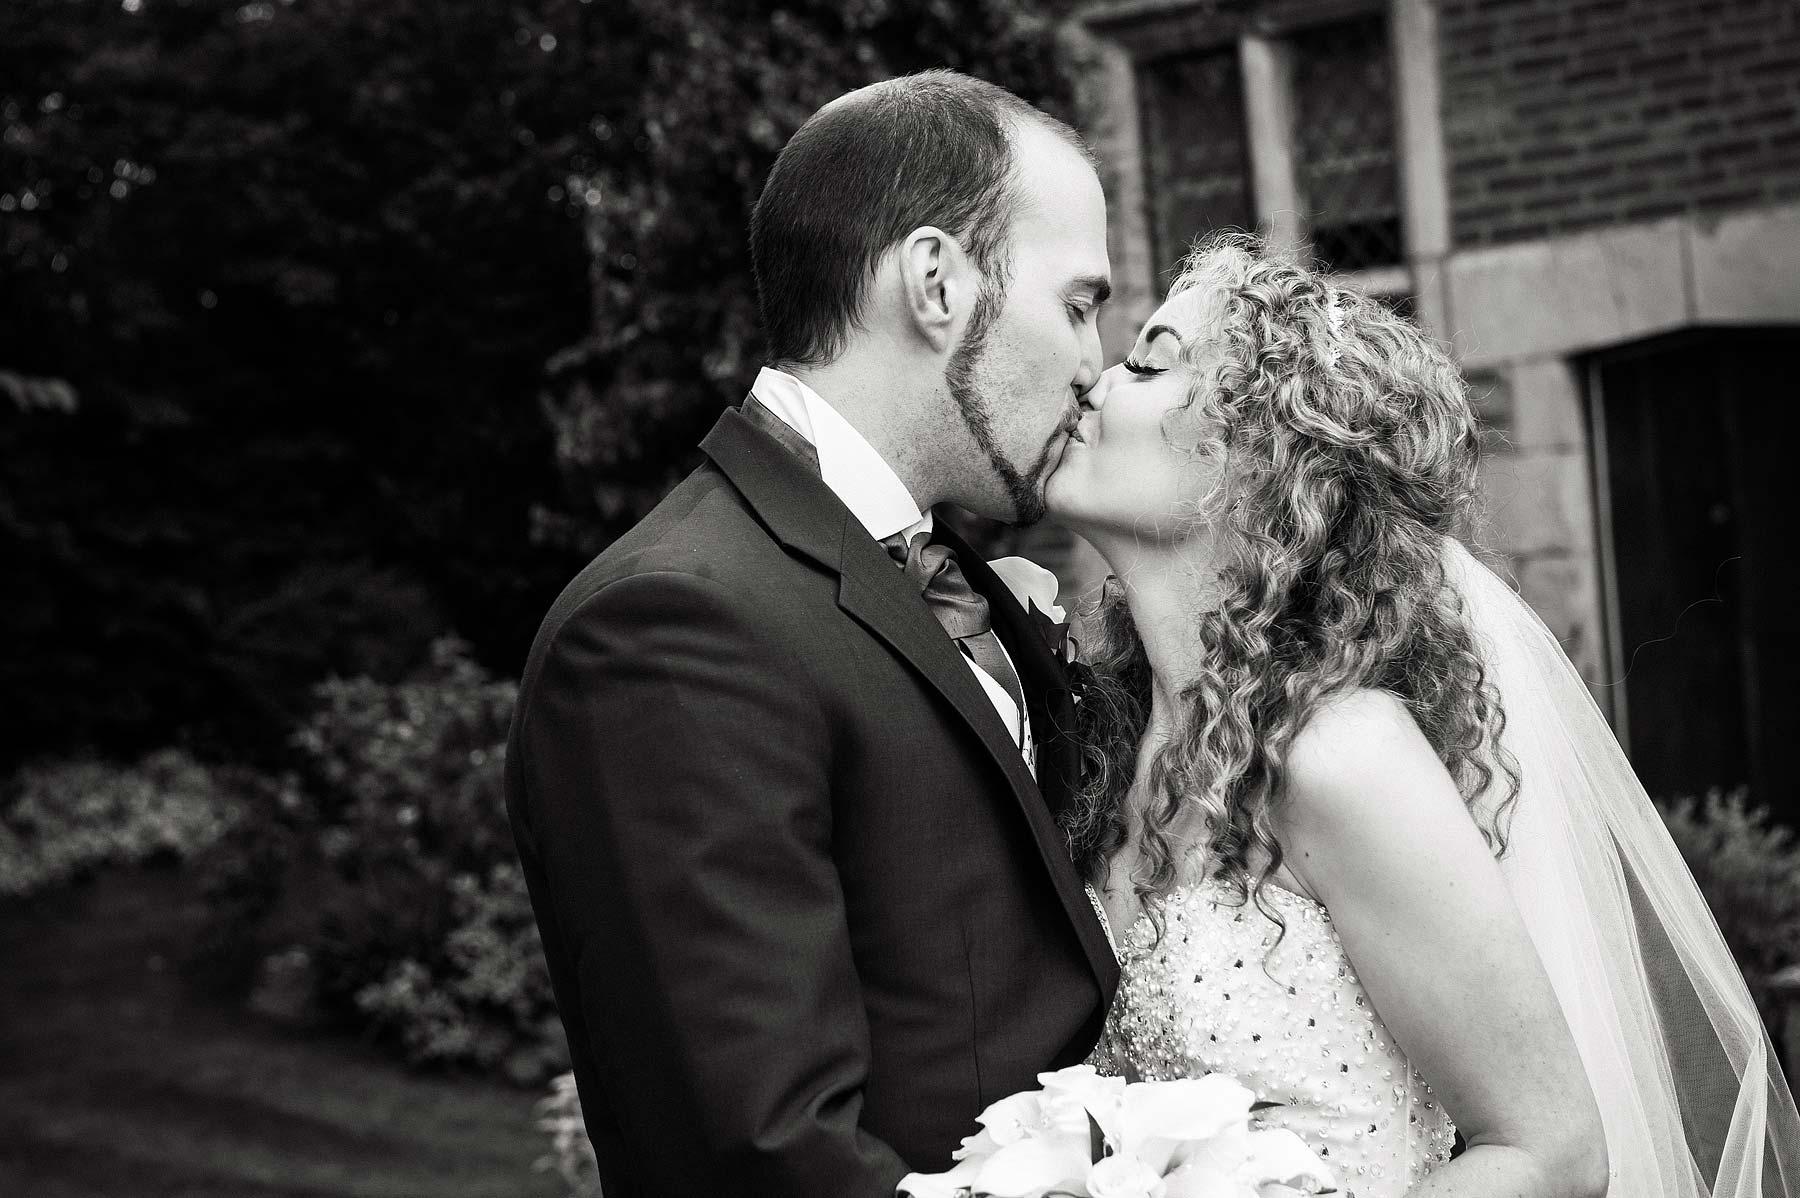 albright-hussey-manor-wedding-photographers-038